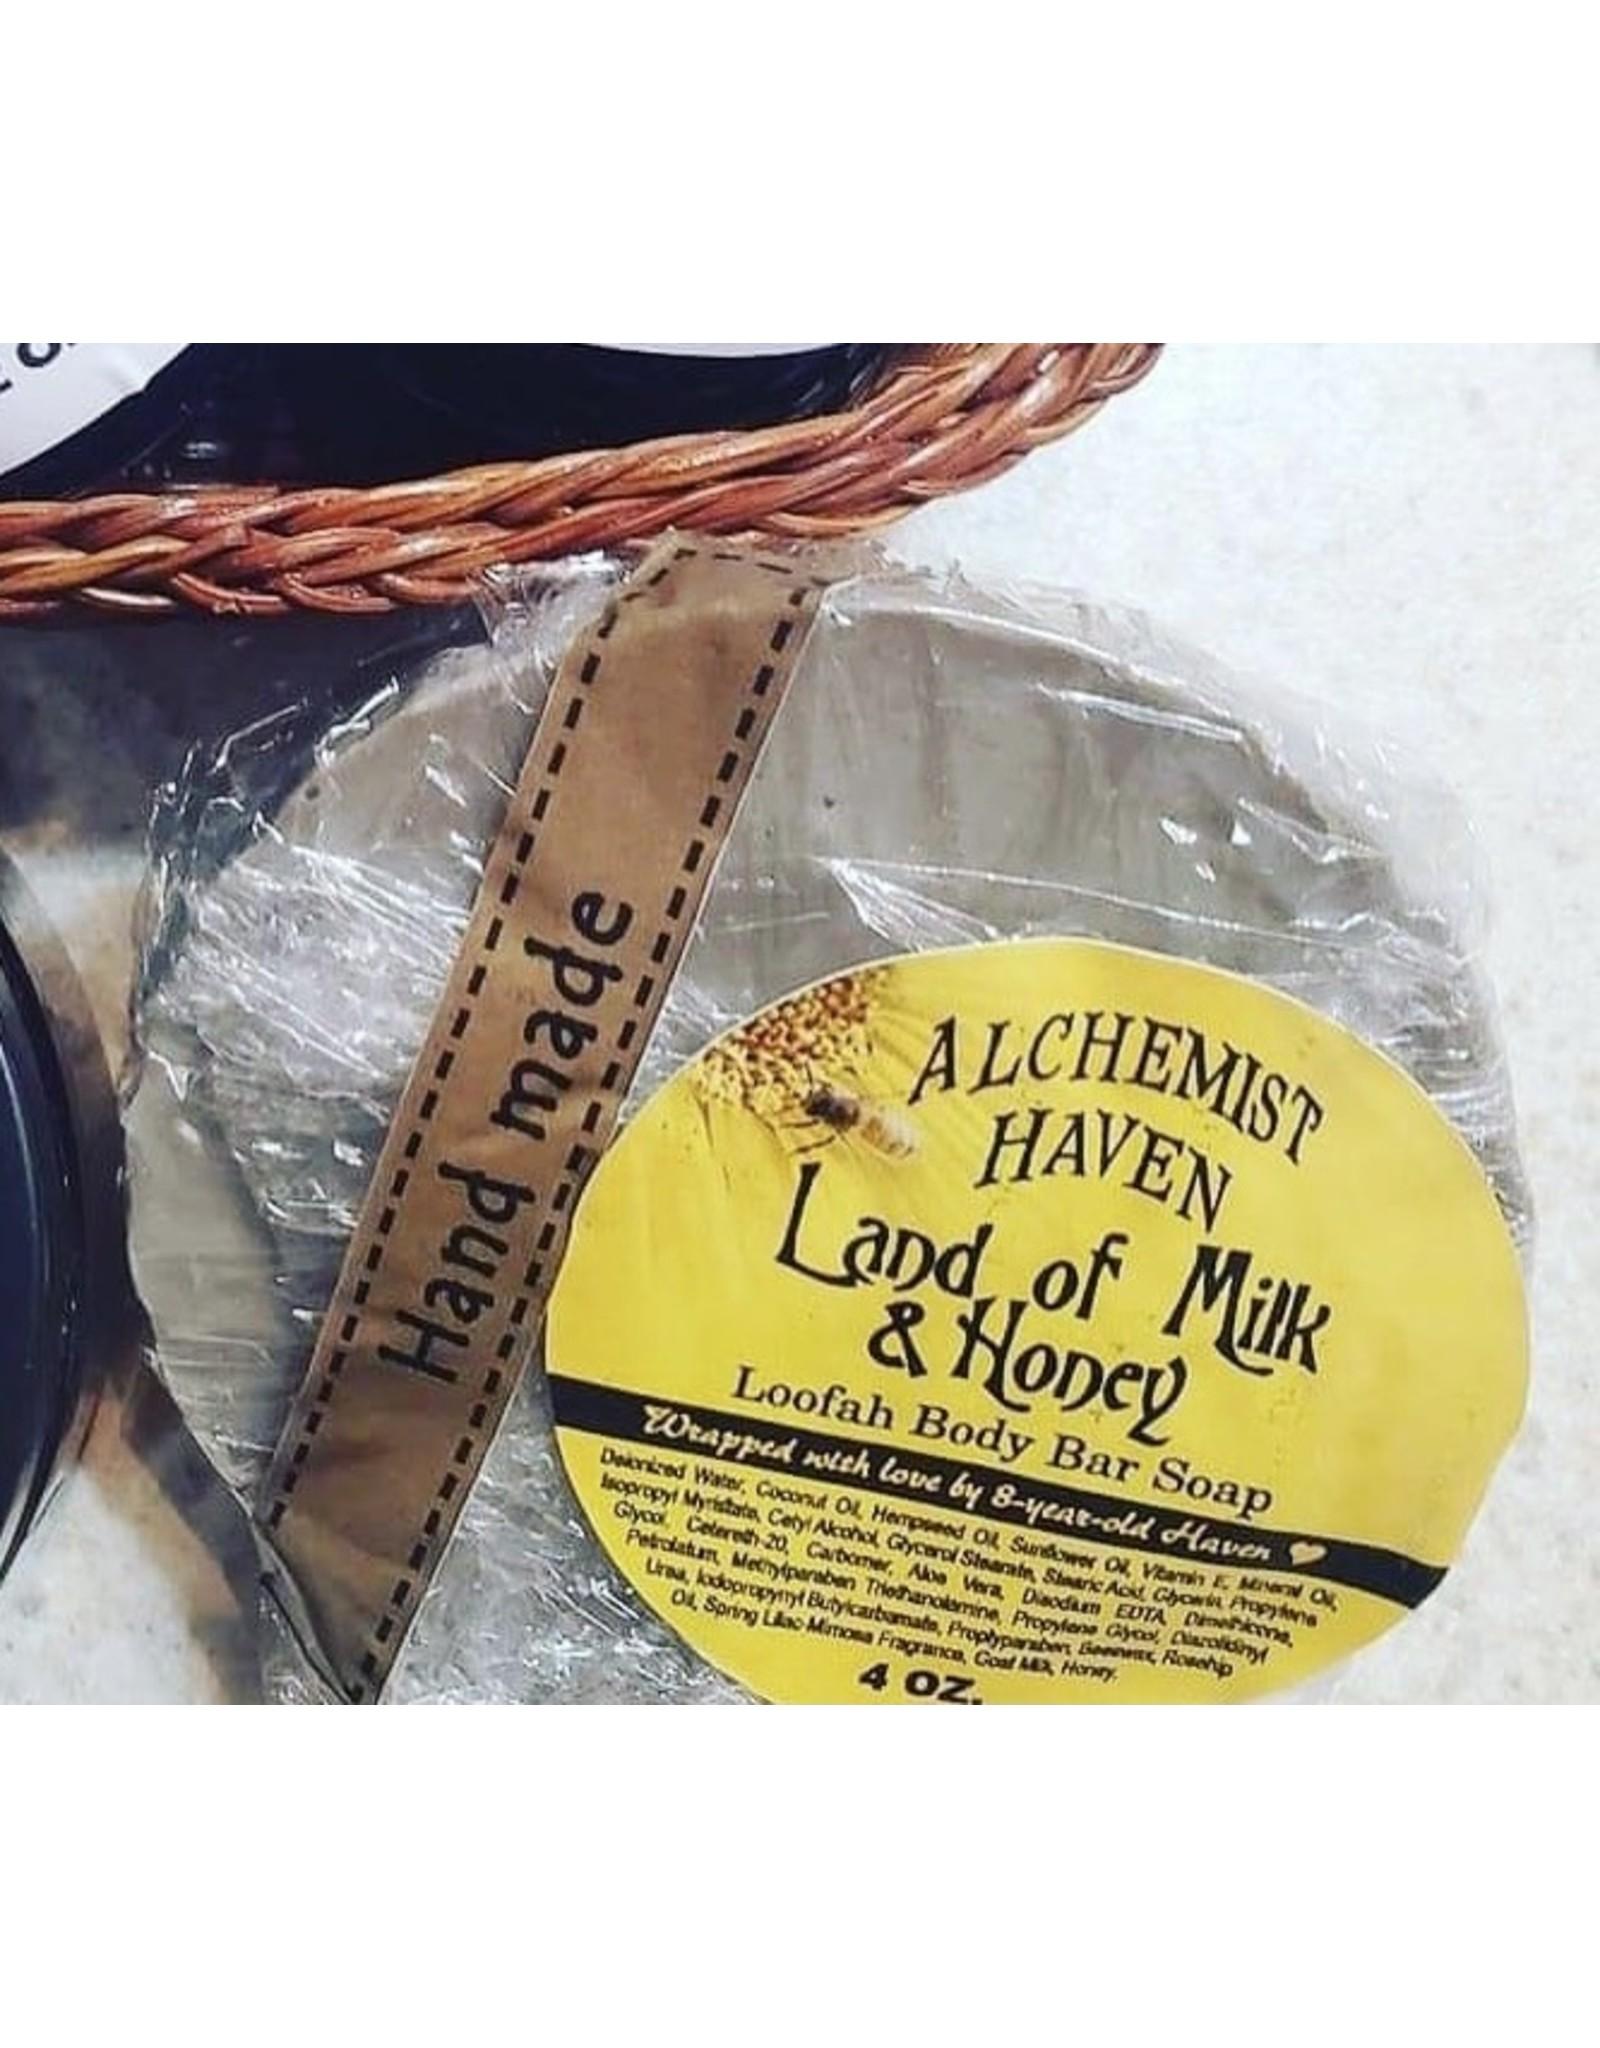 The Florist & The Merchant Land of Milk & Honey Loofah Body Bar